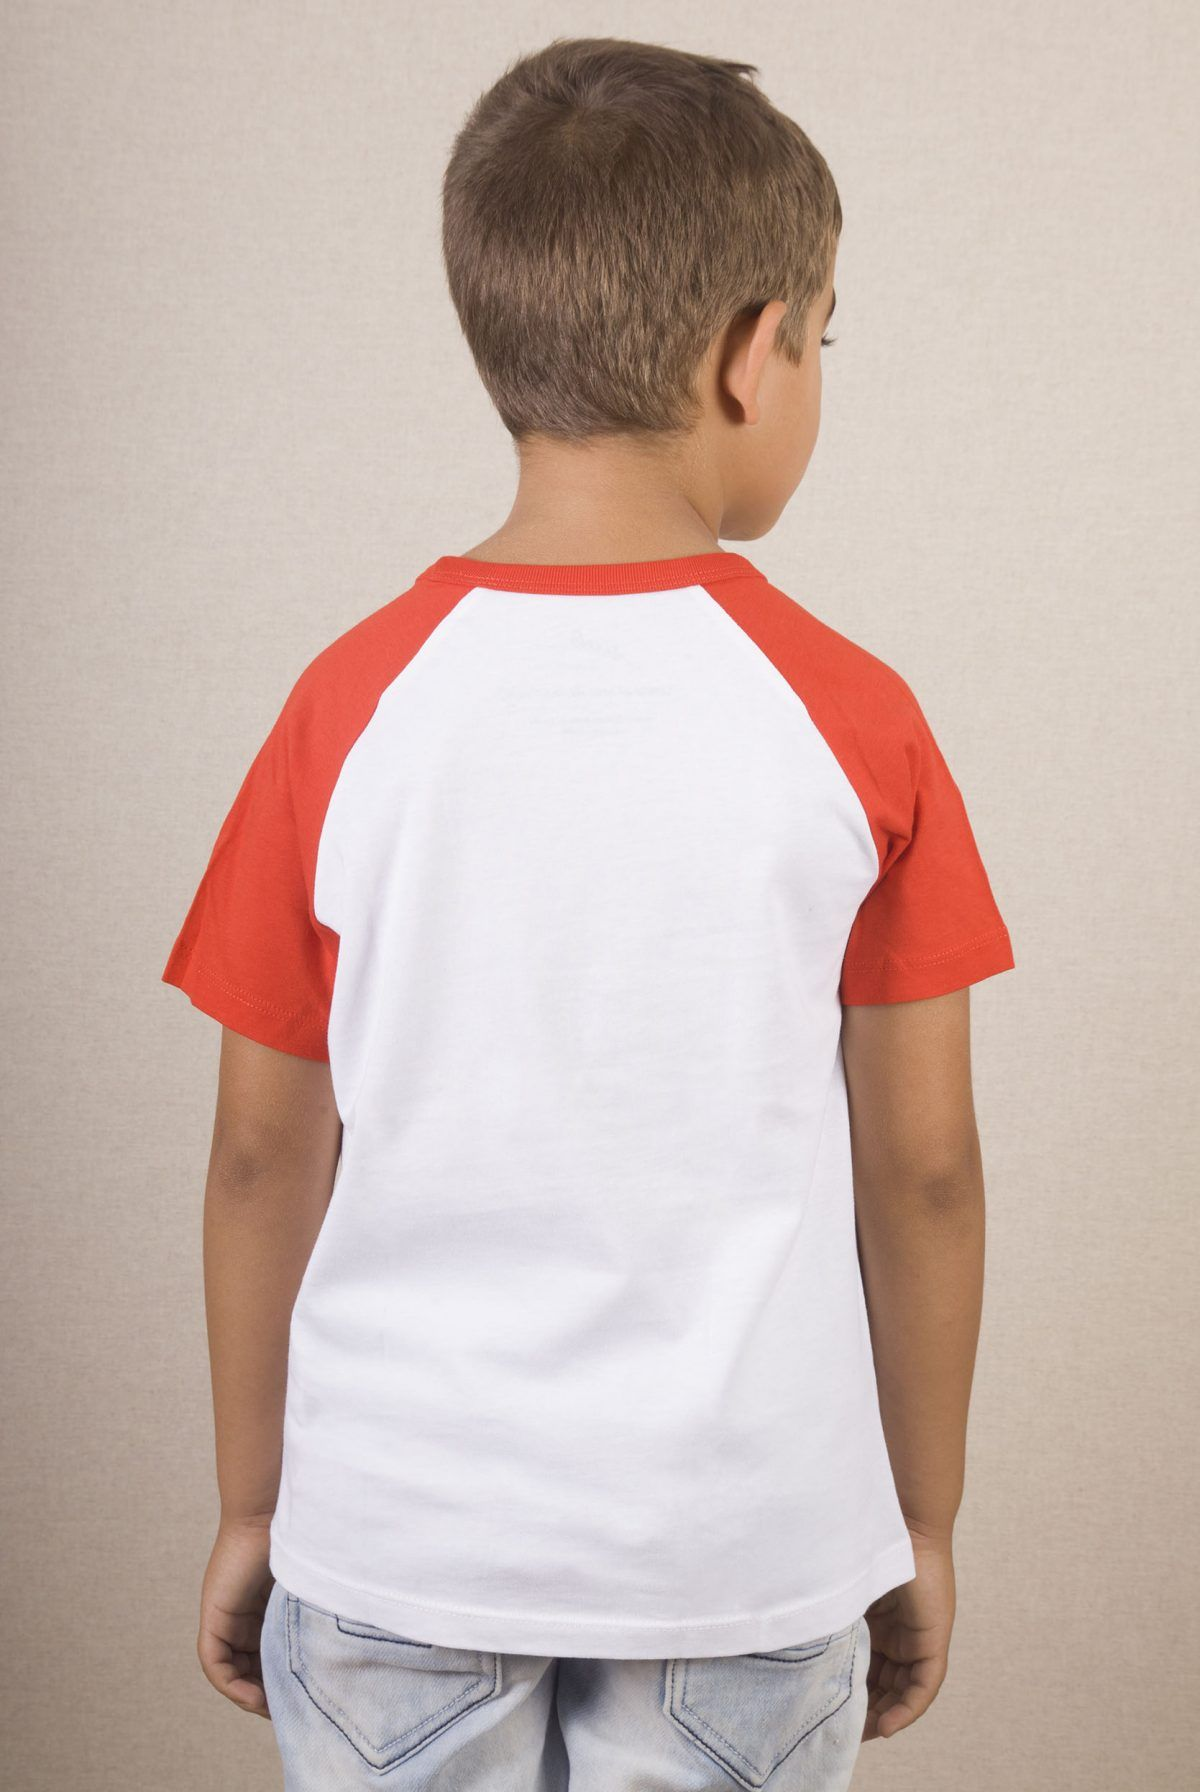 Camiseta Leona niño-sirem wild